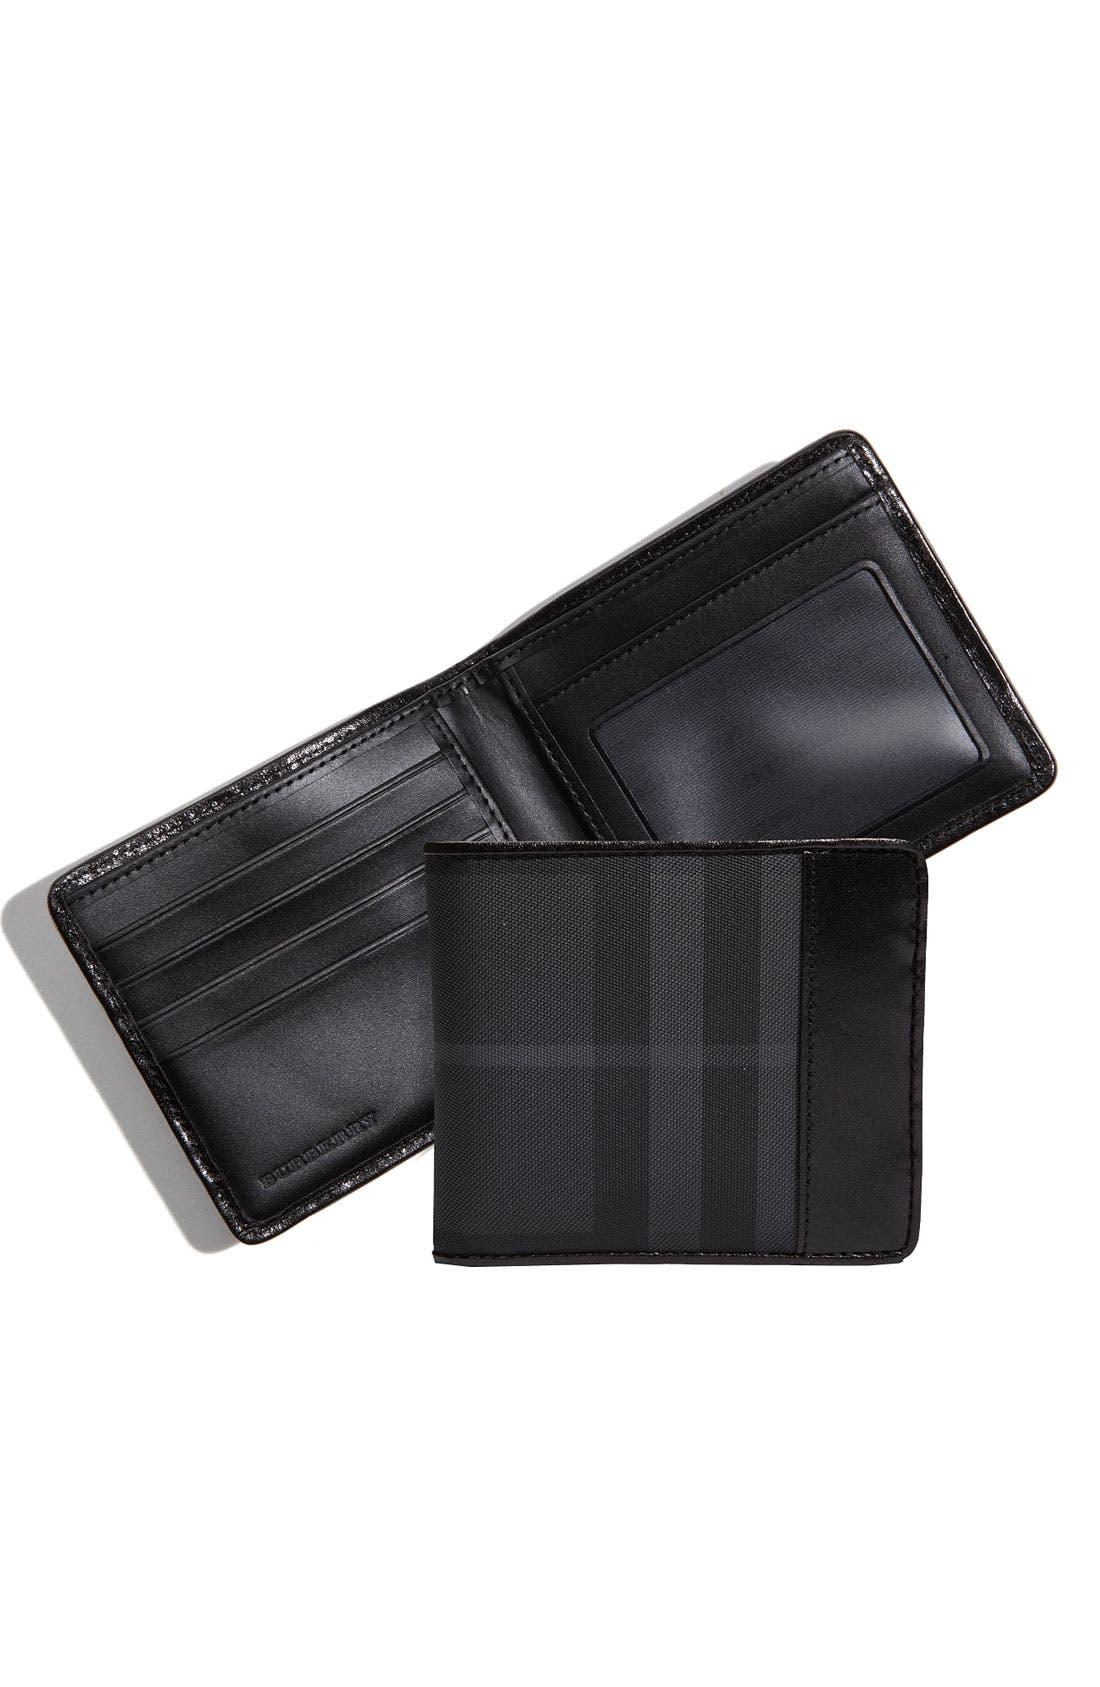 Alternate Image 4  - Burberry Check Print Billfold Wallet